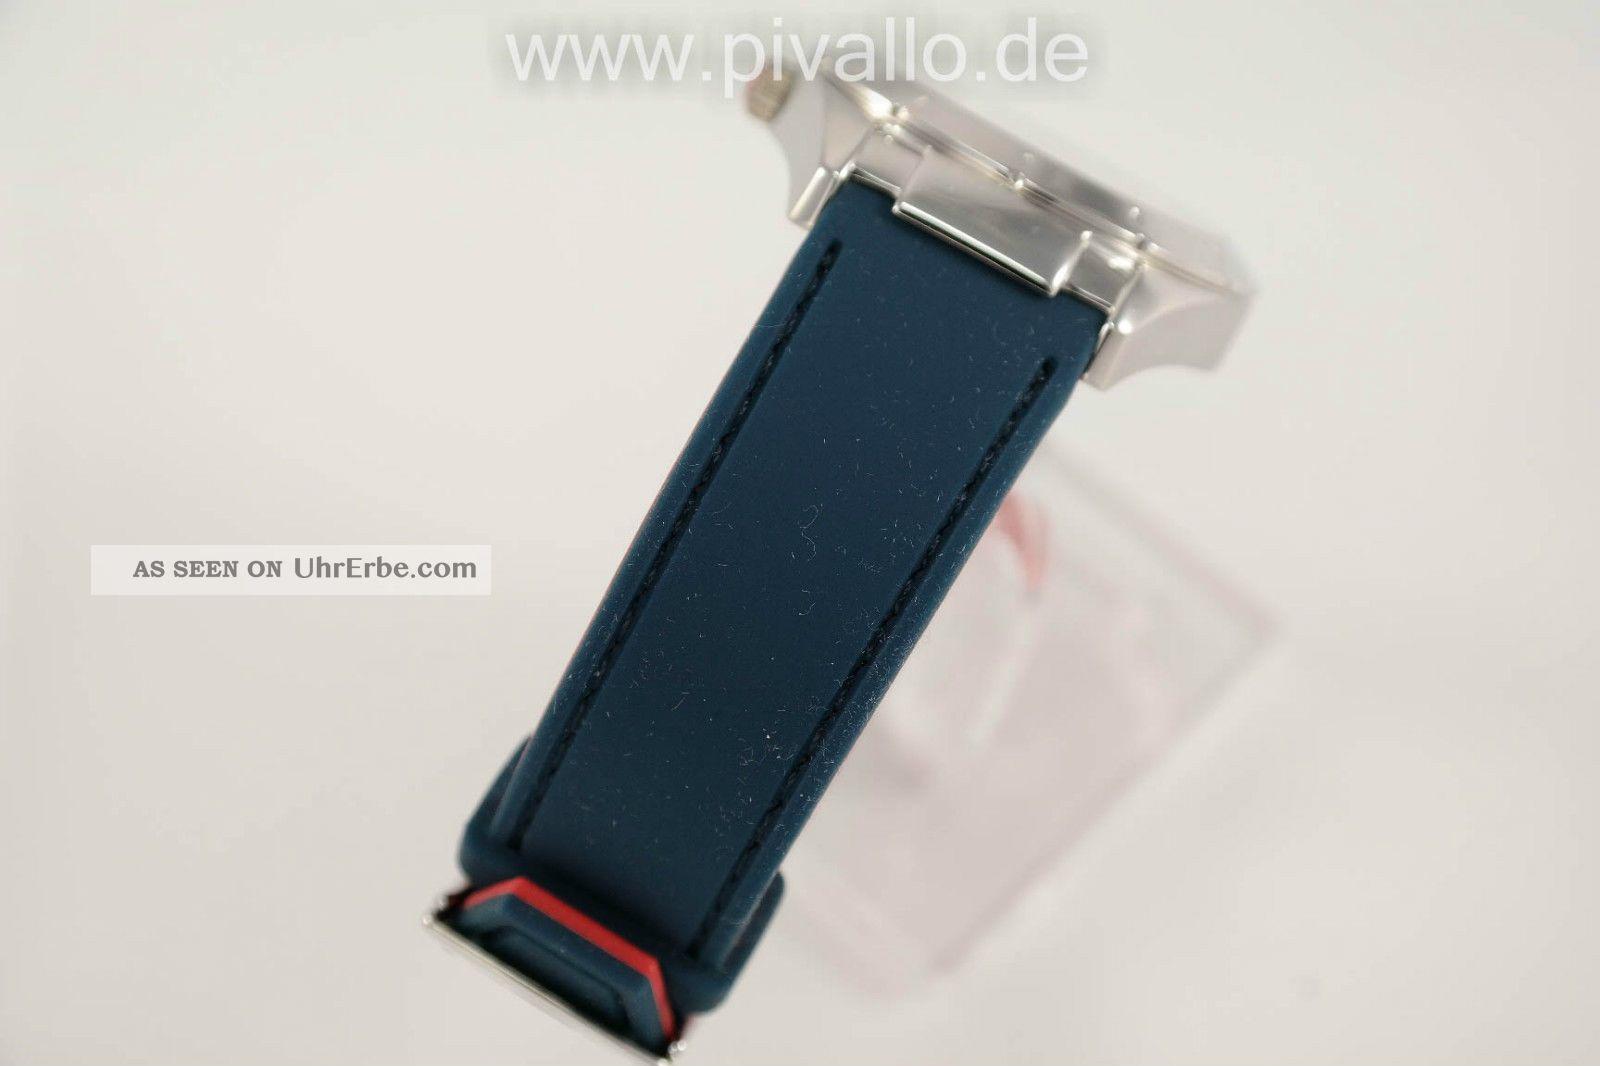 tommy hilfiger damenuhr damen uhr silikon armband drehbar blau rot. Black Bedroom Furniture Sets. Home Design Ideas